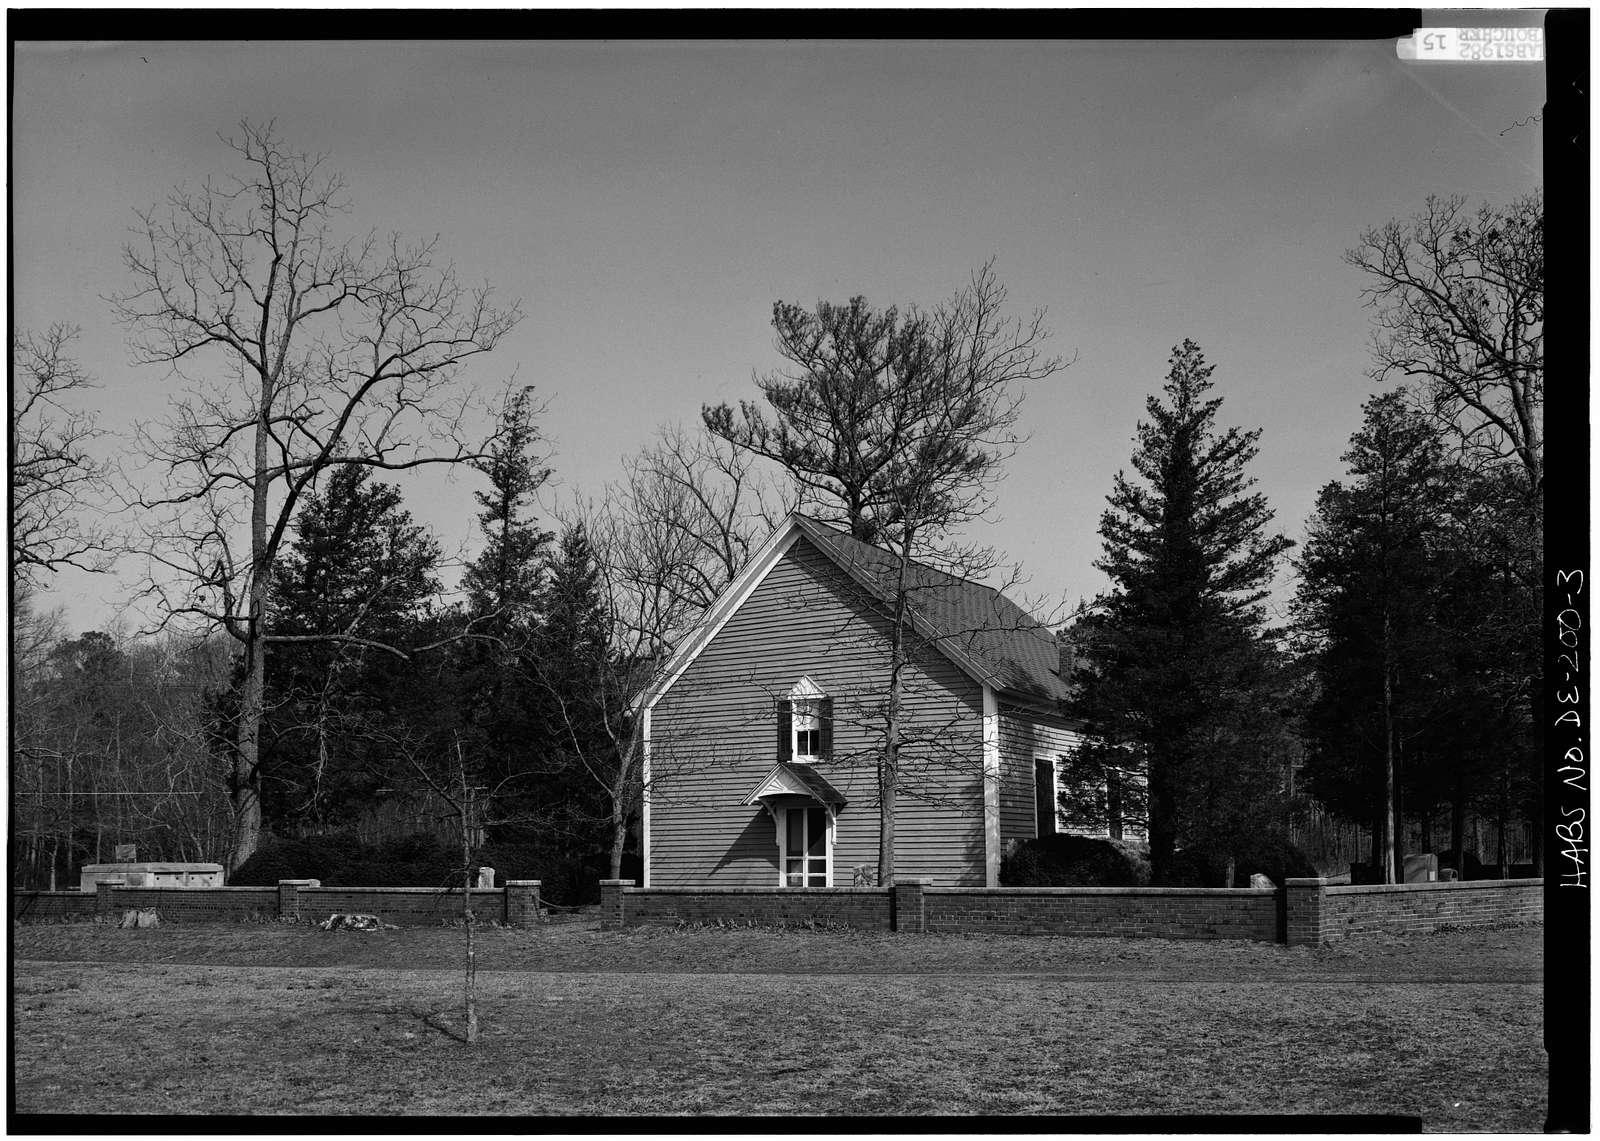 Blackwater Presbyterian Church, State Road 54, Clarksville, Sussex County, DE